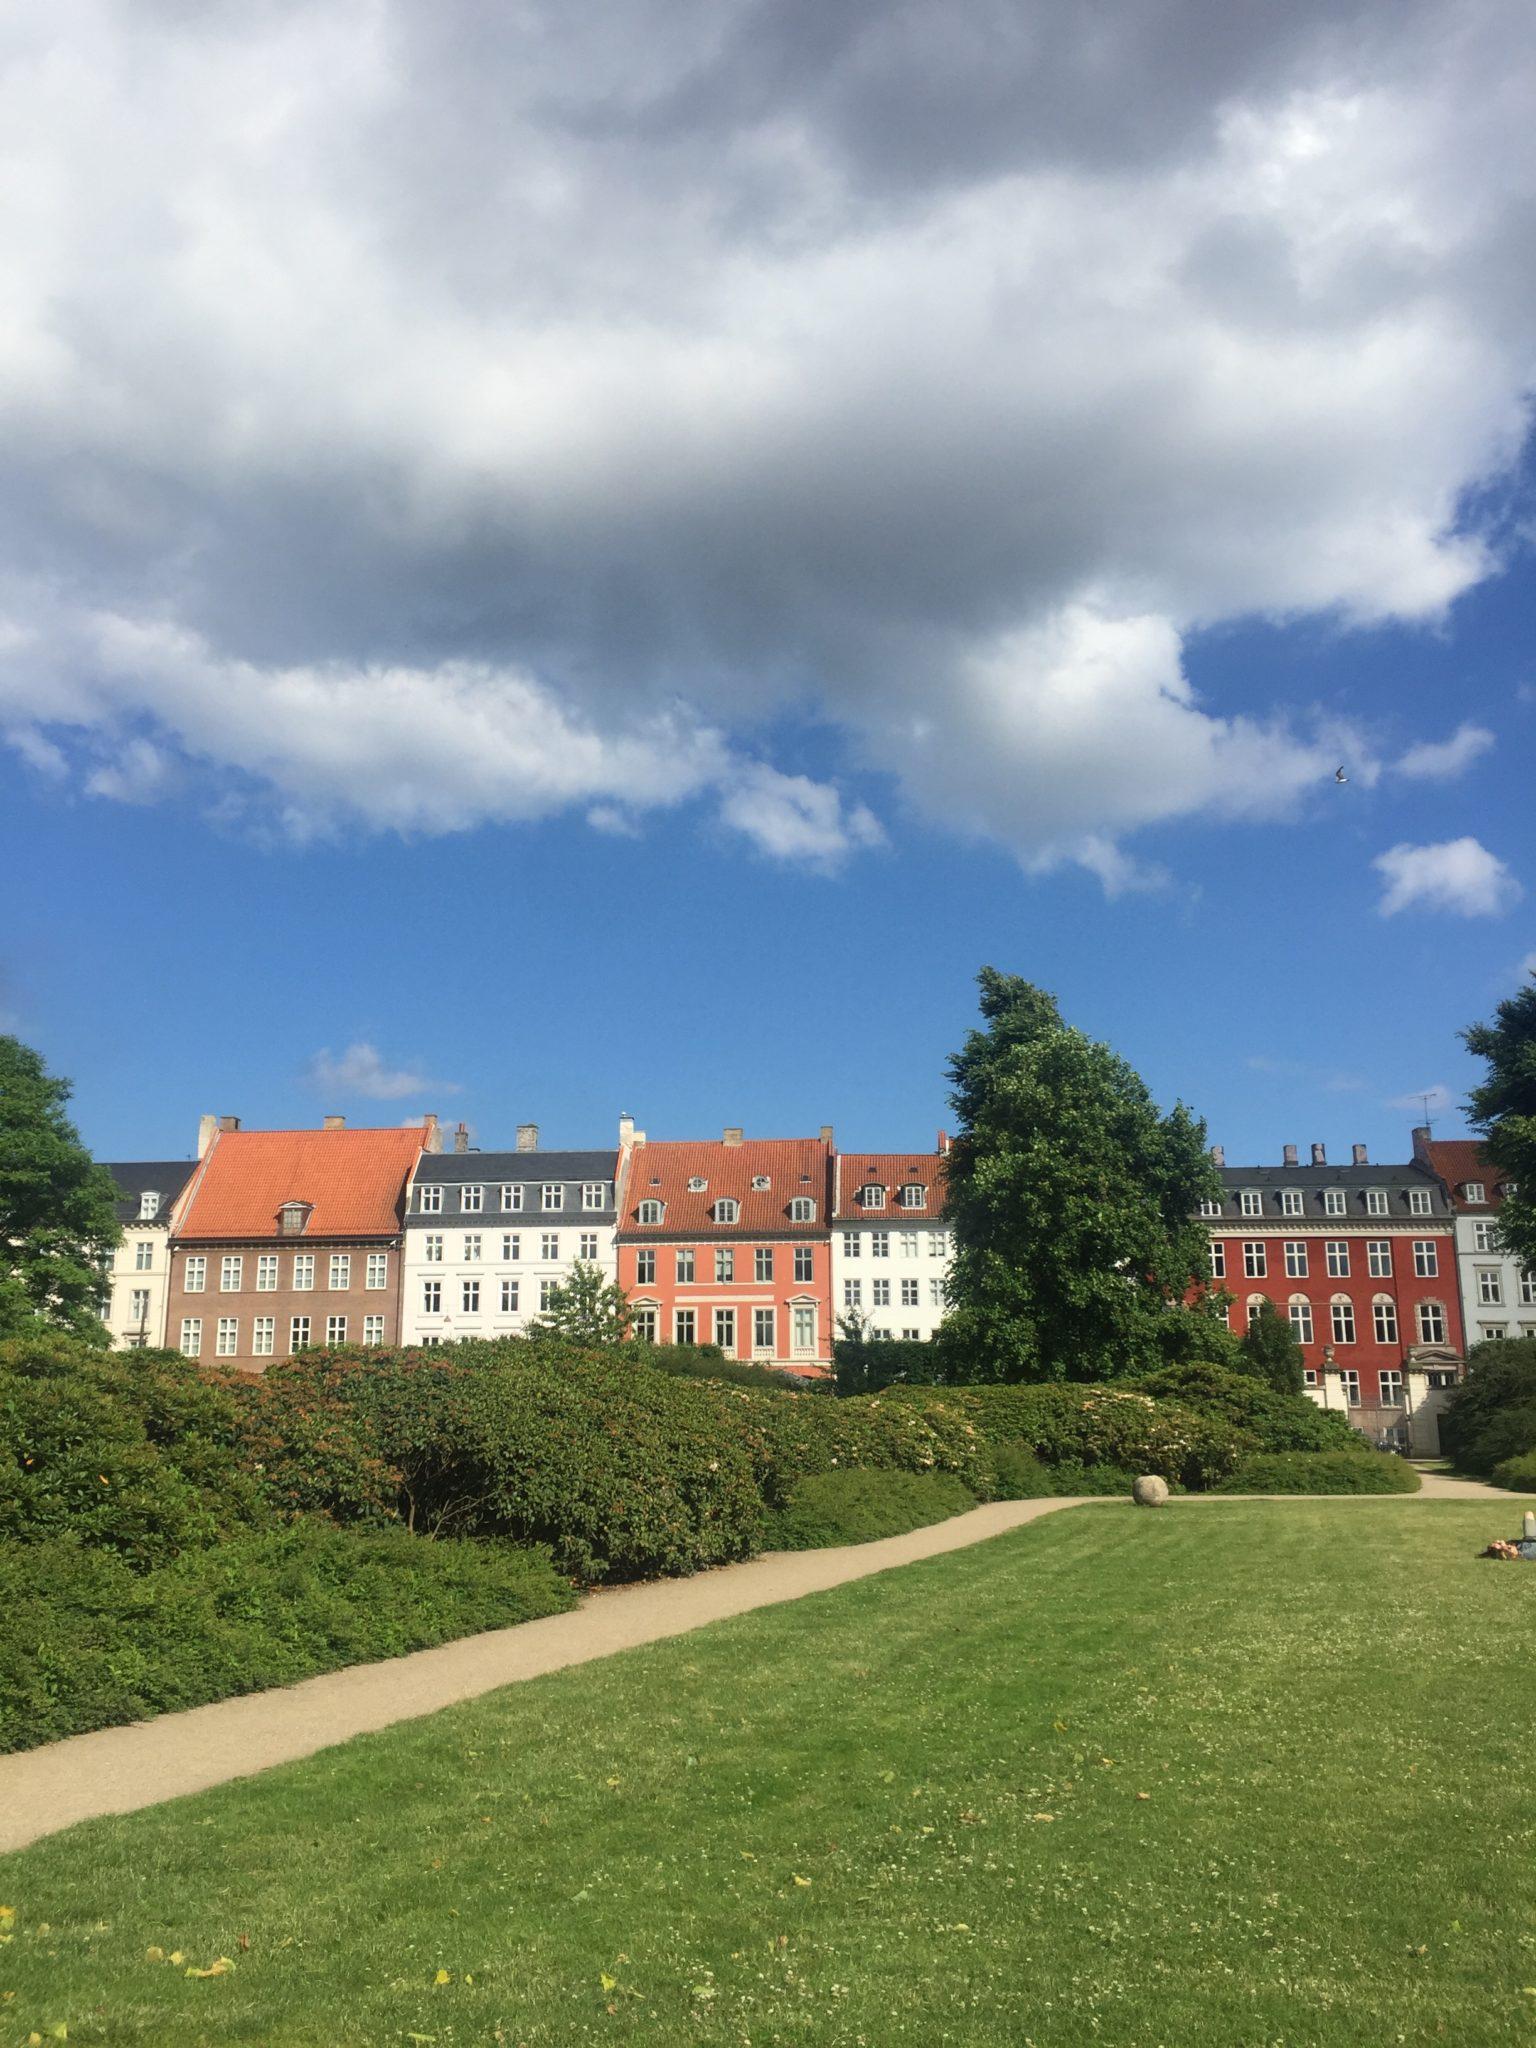 Kronprinsessegade houses